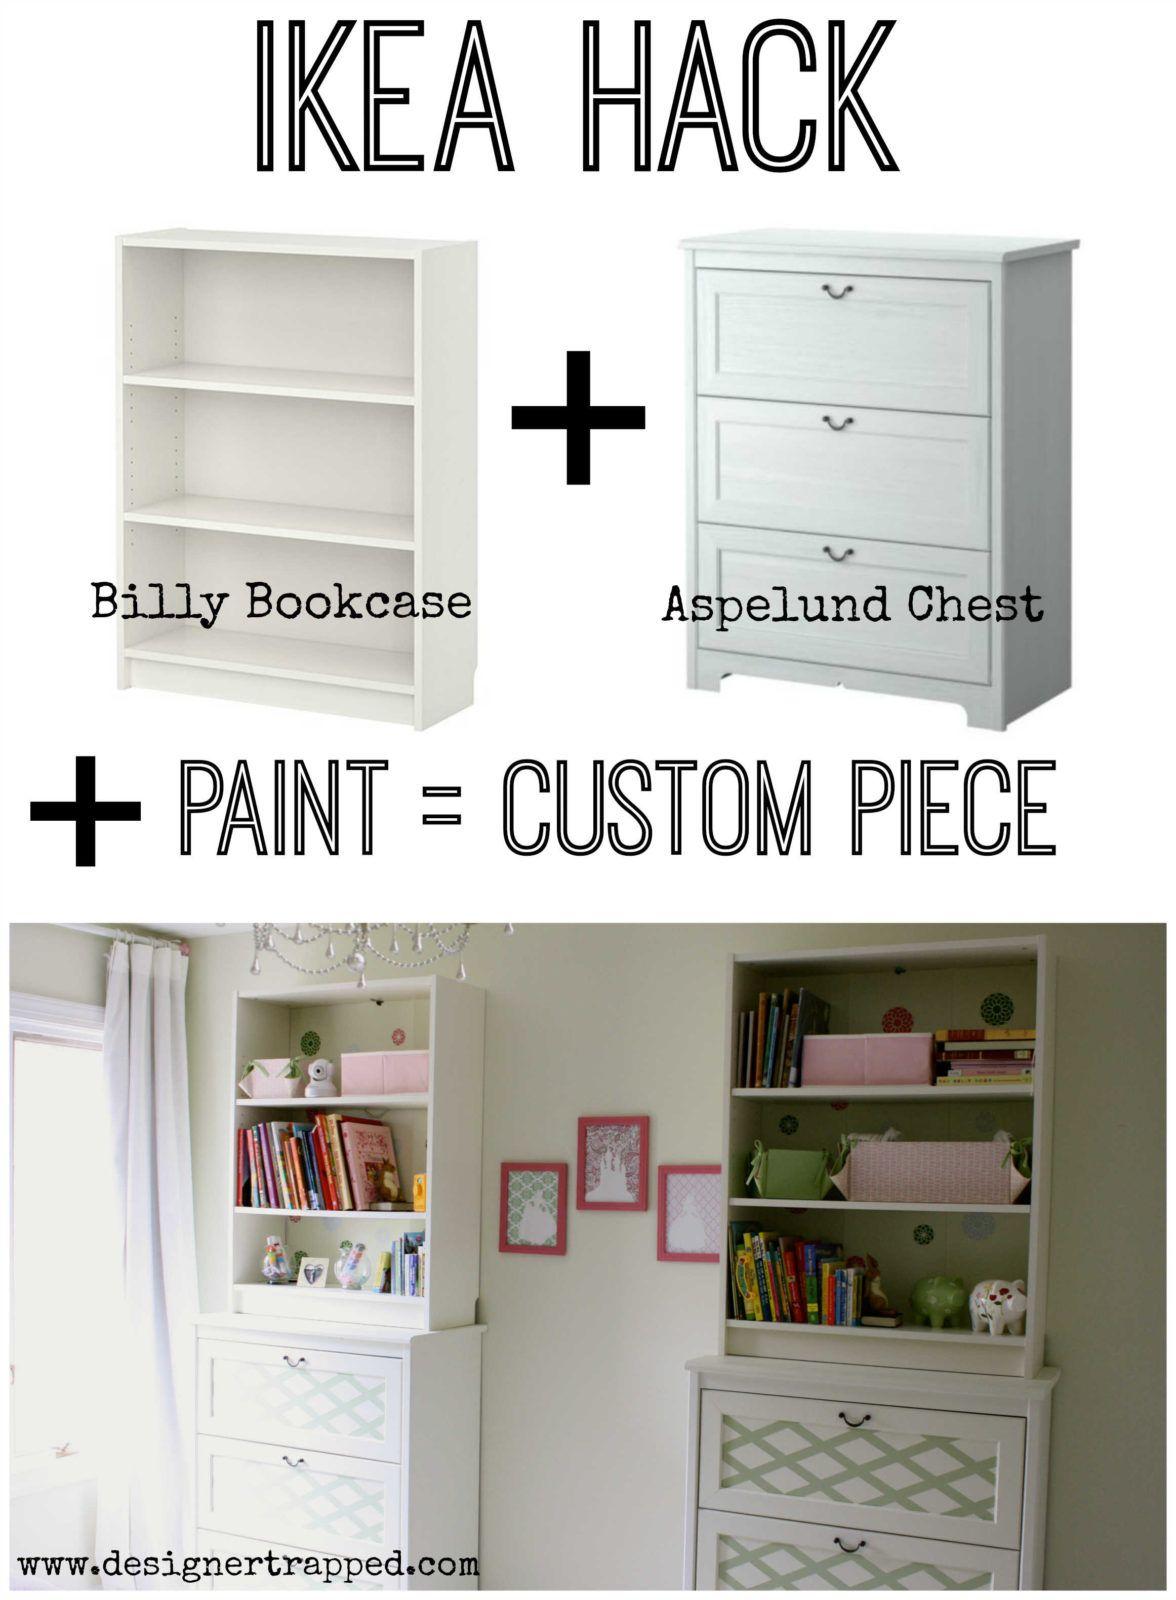 ikea dorm furniture. Dorm Furniture Ikea. 10 Fabulous Ikea Hacks: How To Customize Furniture!